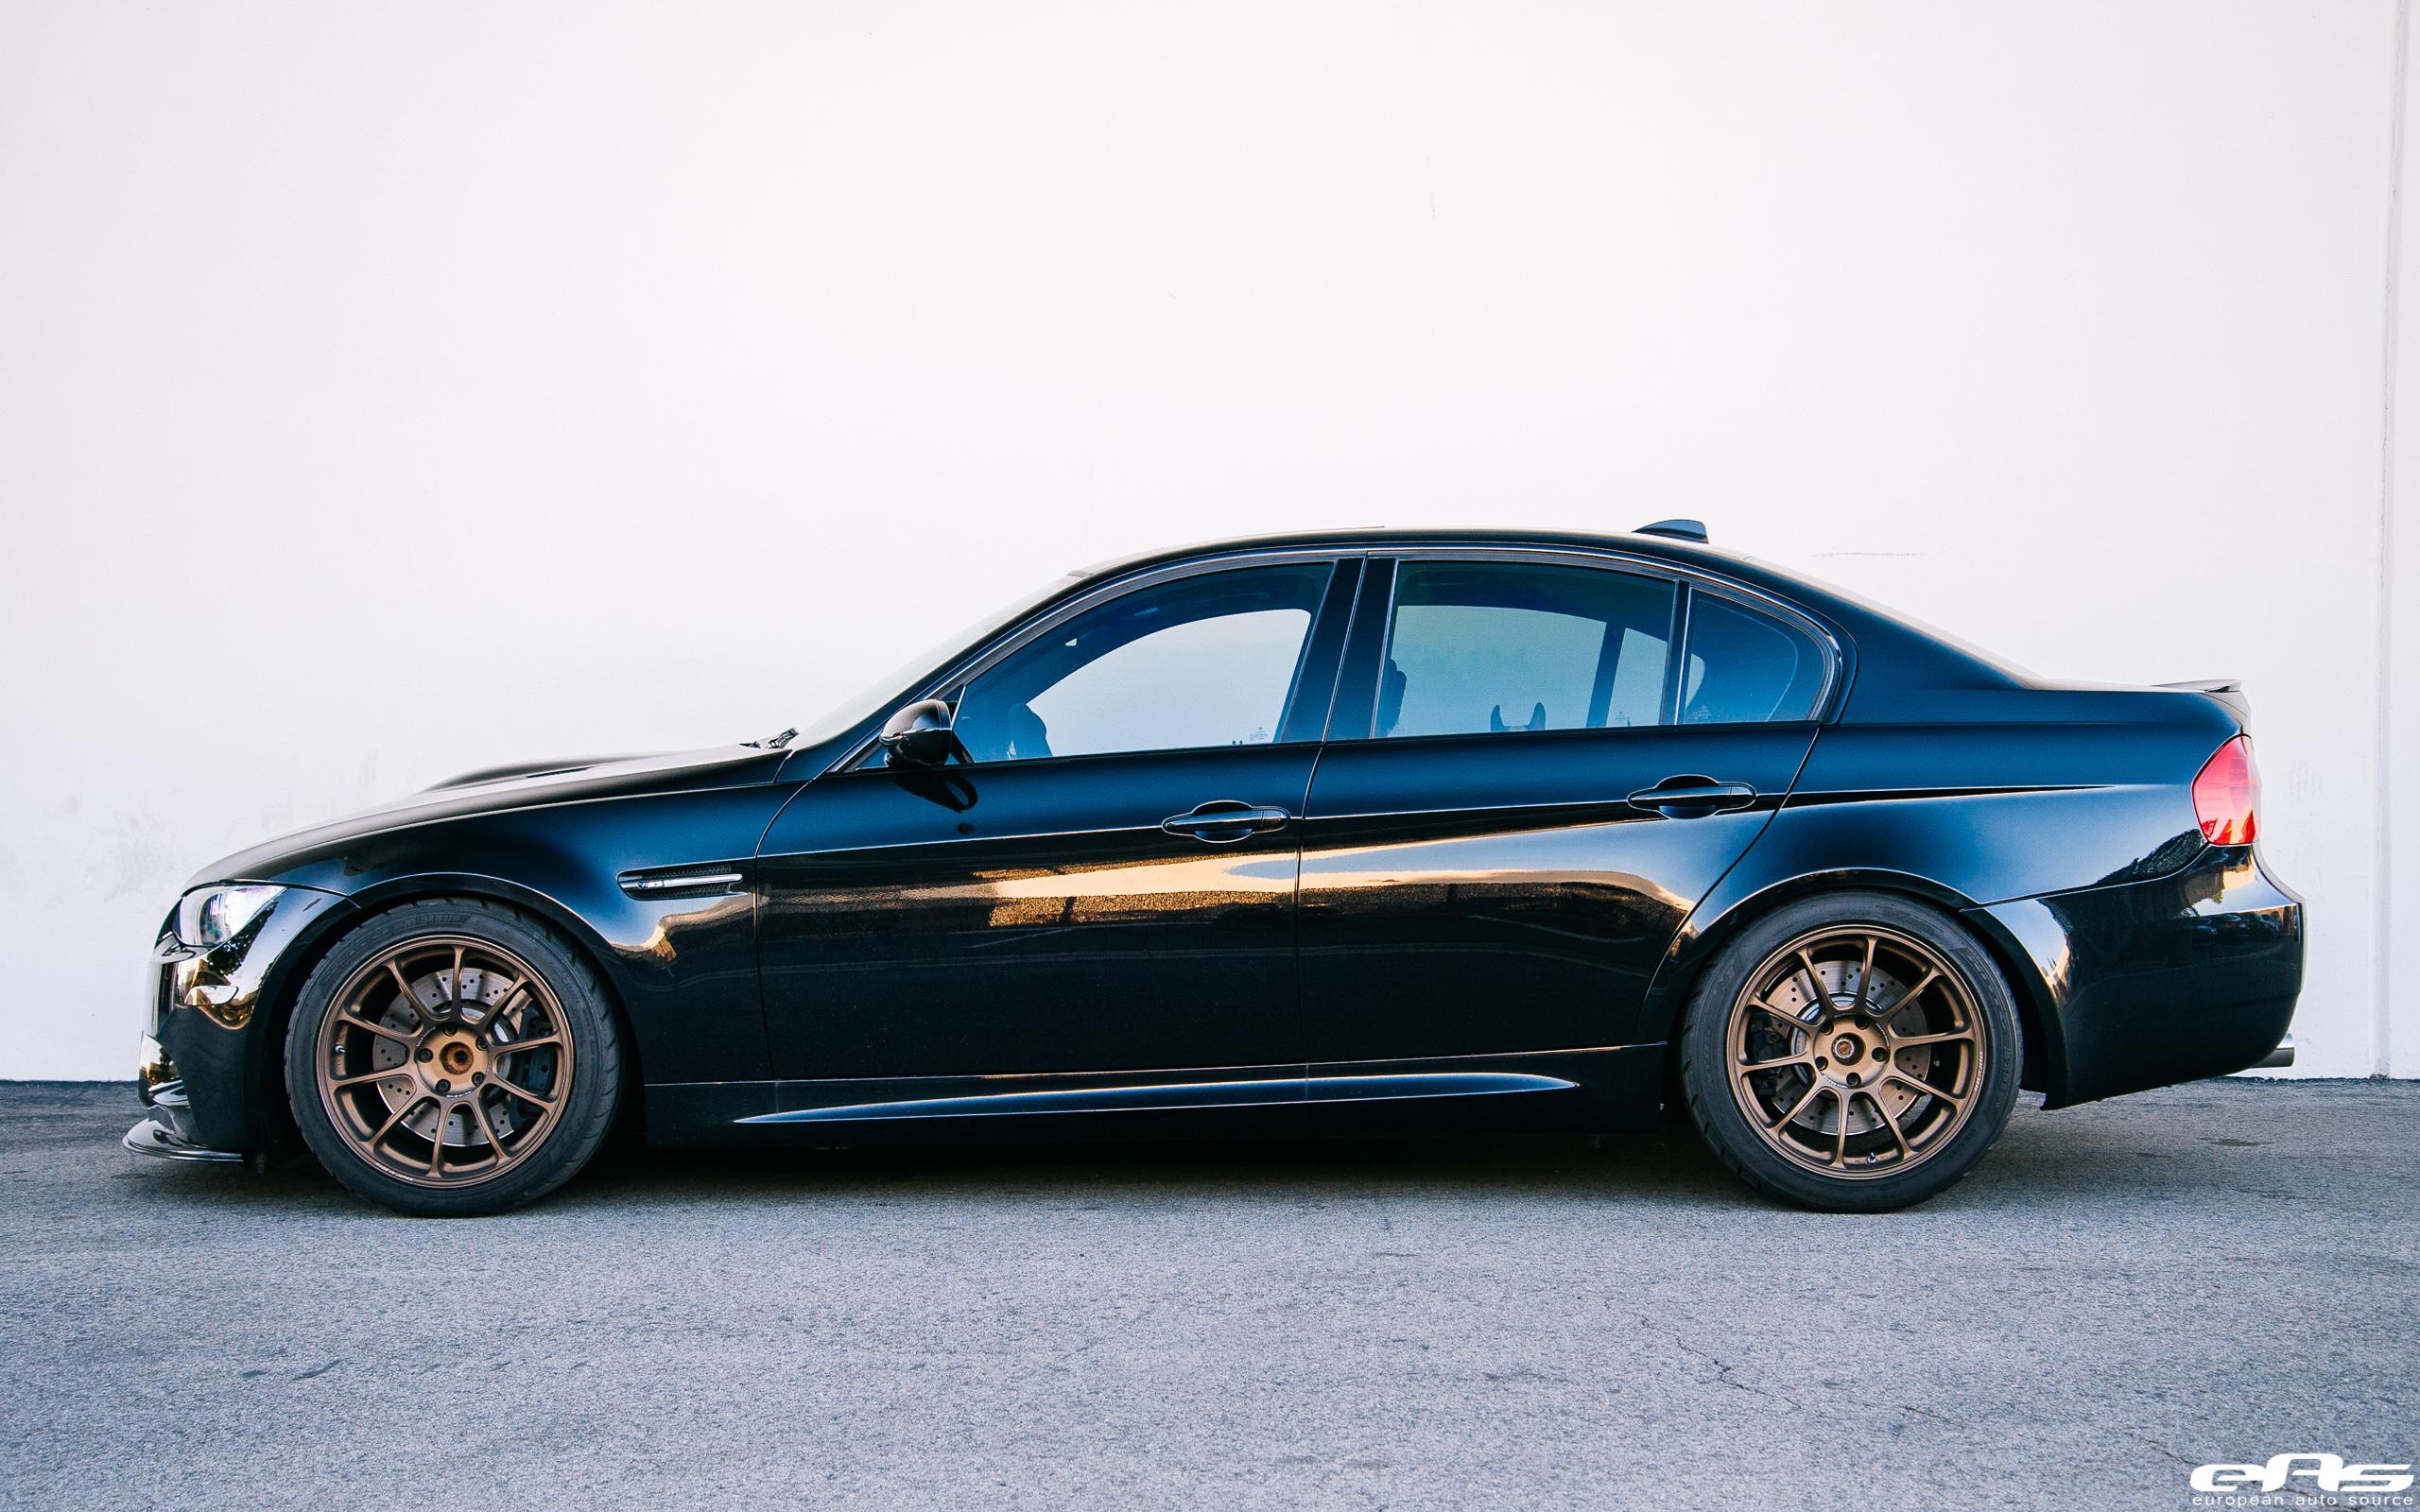 Jerez Black E90 M3 Jdm Style Bmw Performance Parts Services